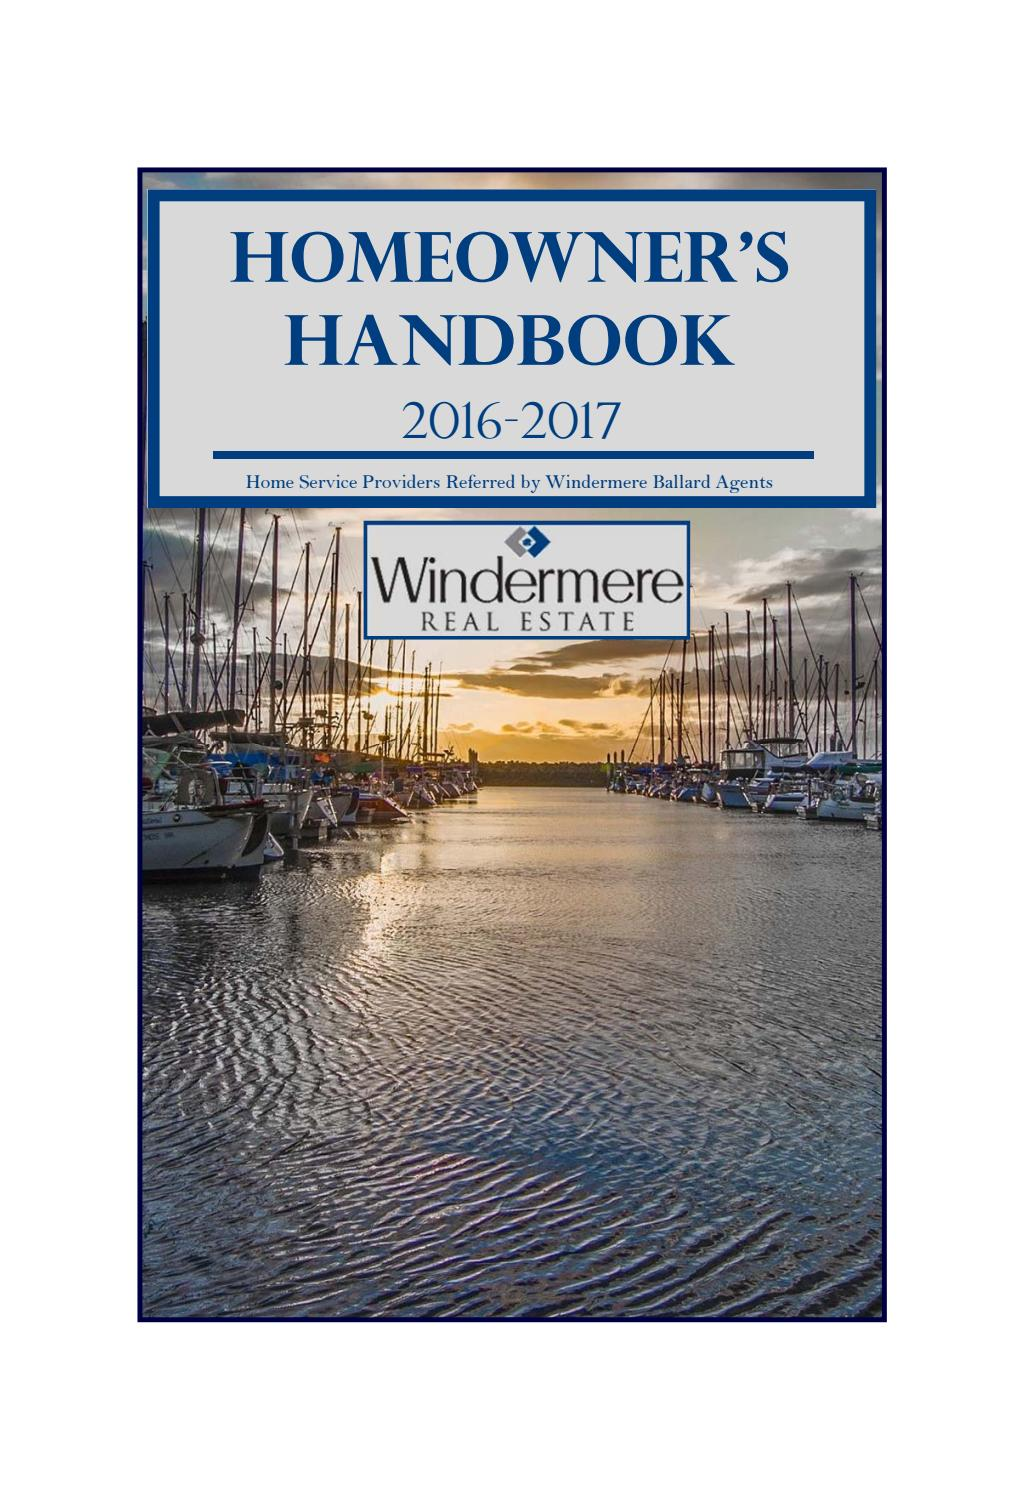 homeowner's handbook wre ballard 16-17anniedoyon - issuu